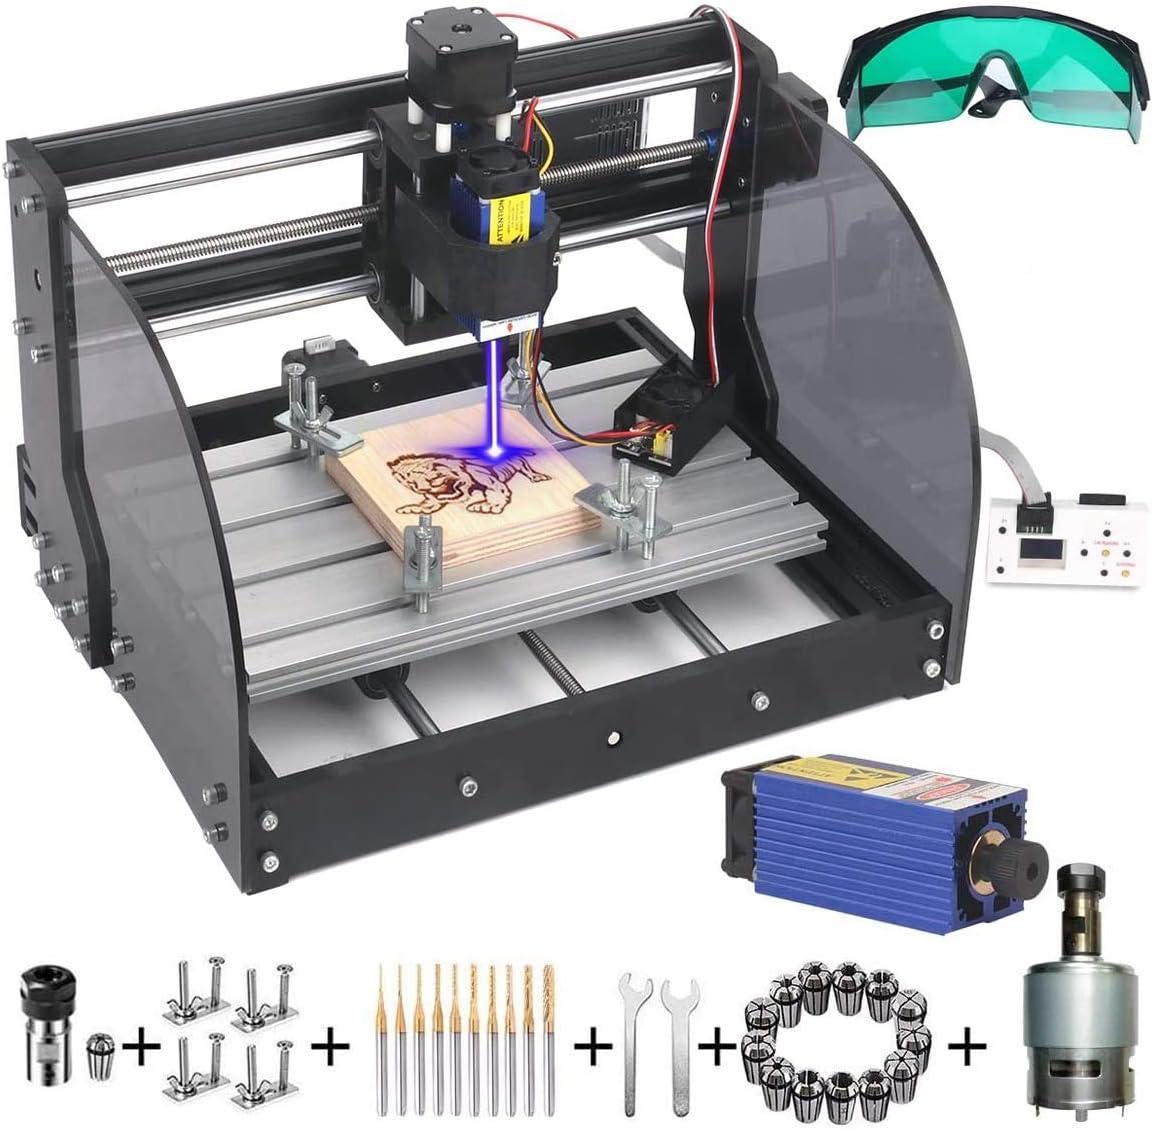 price MYSWEETY 2 in 1 7000mW CNC Engraver 5 popular GRBL 3018Pro-M Machine Cont